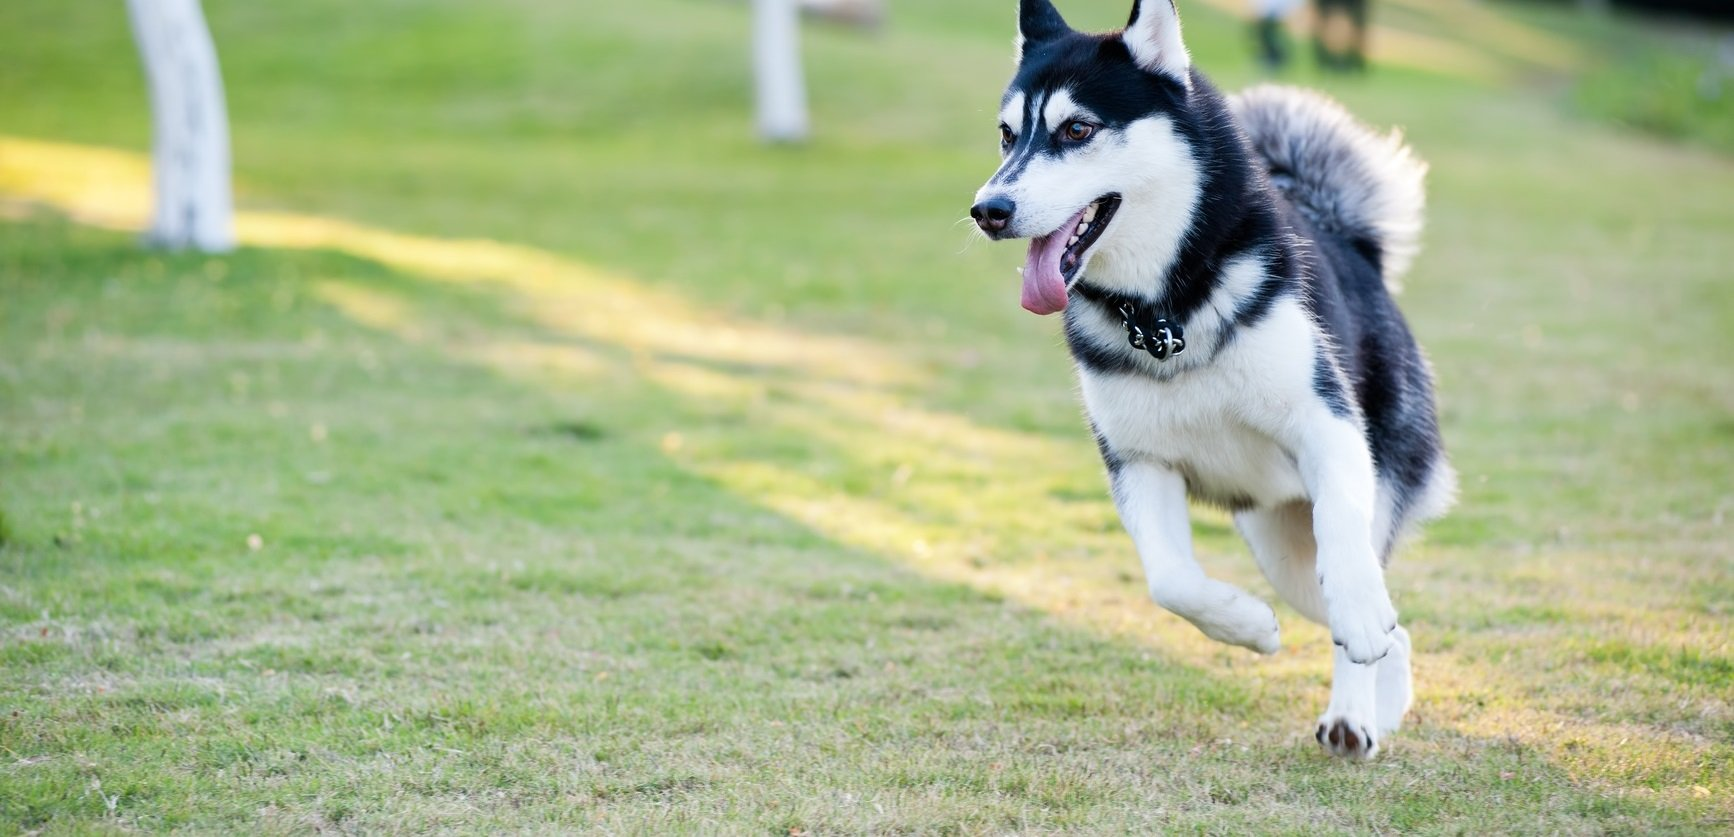 photodune-943742-alaskan-malamute-dog-running-m-wi